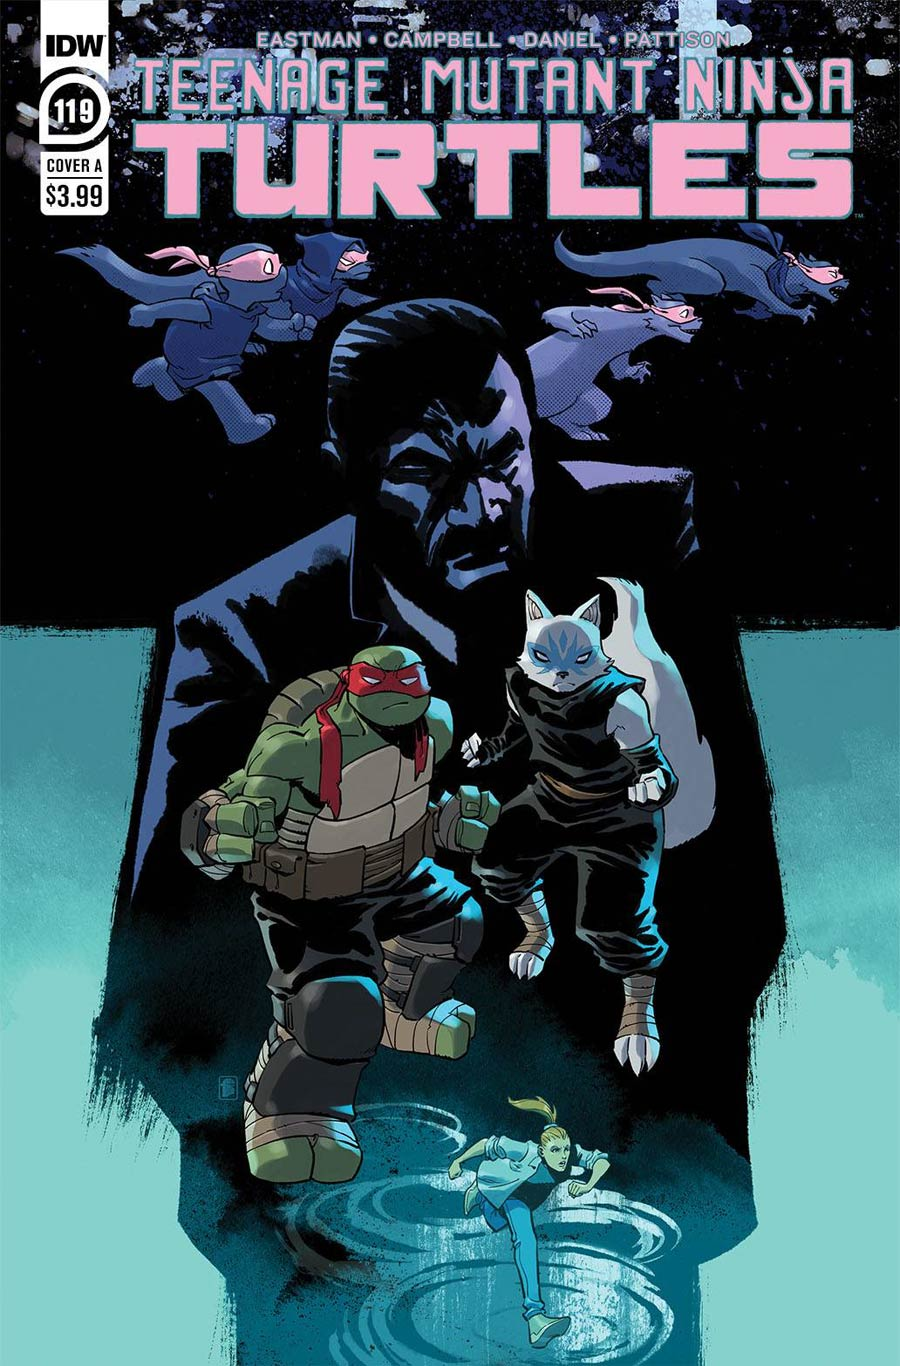 Teenage Mutant Ninja Turtles Vol 5 #119 Cover A Regular Nelson Daniel Cover